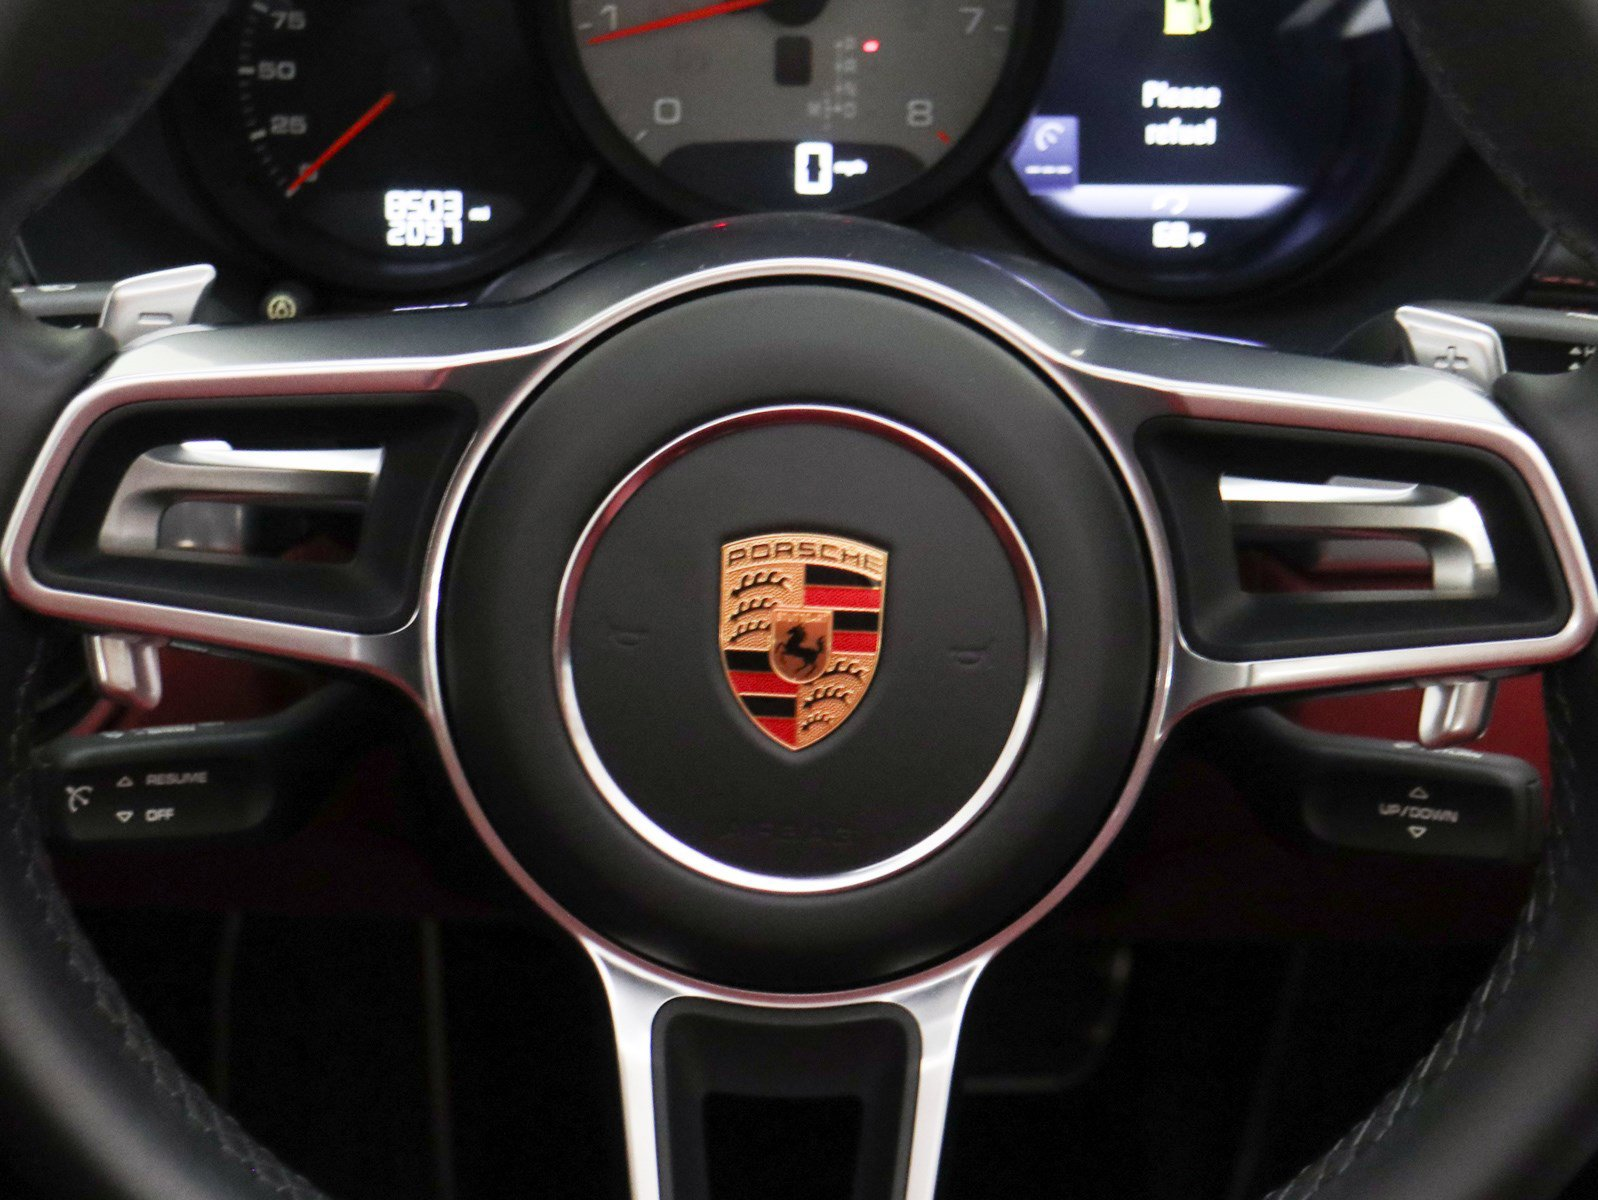 Pre-Owned 2019 Porsche 718 Boxster S